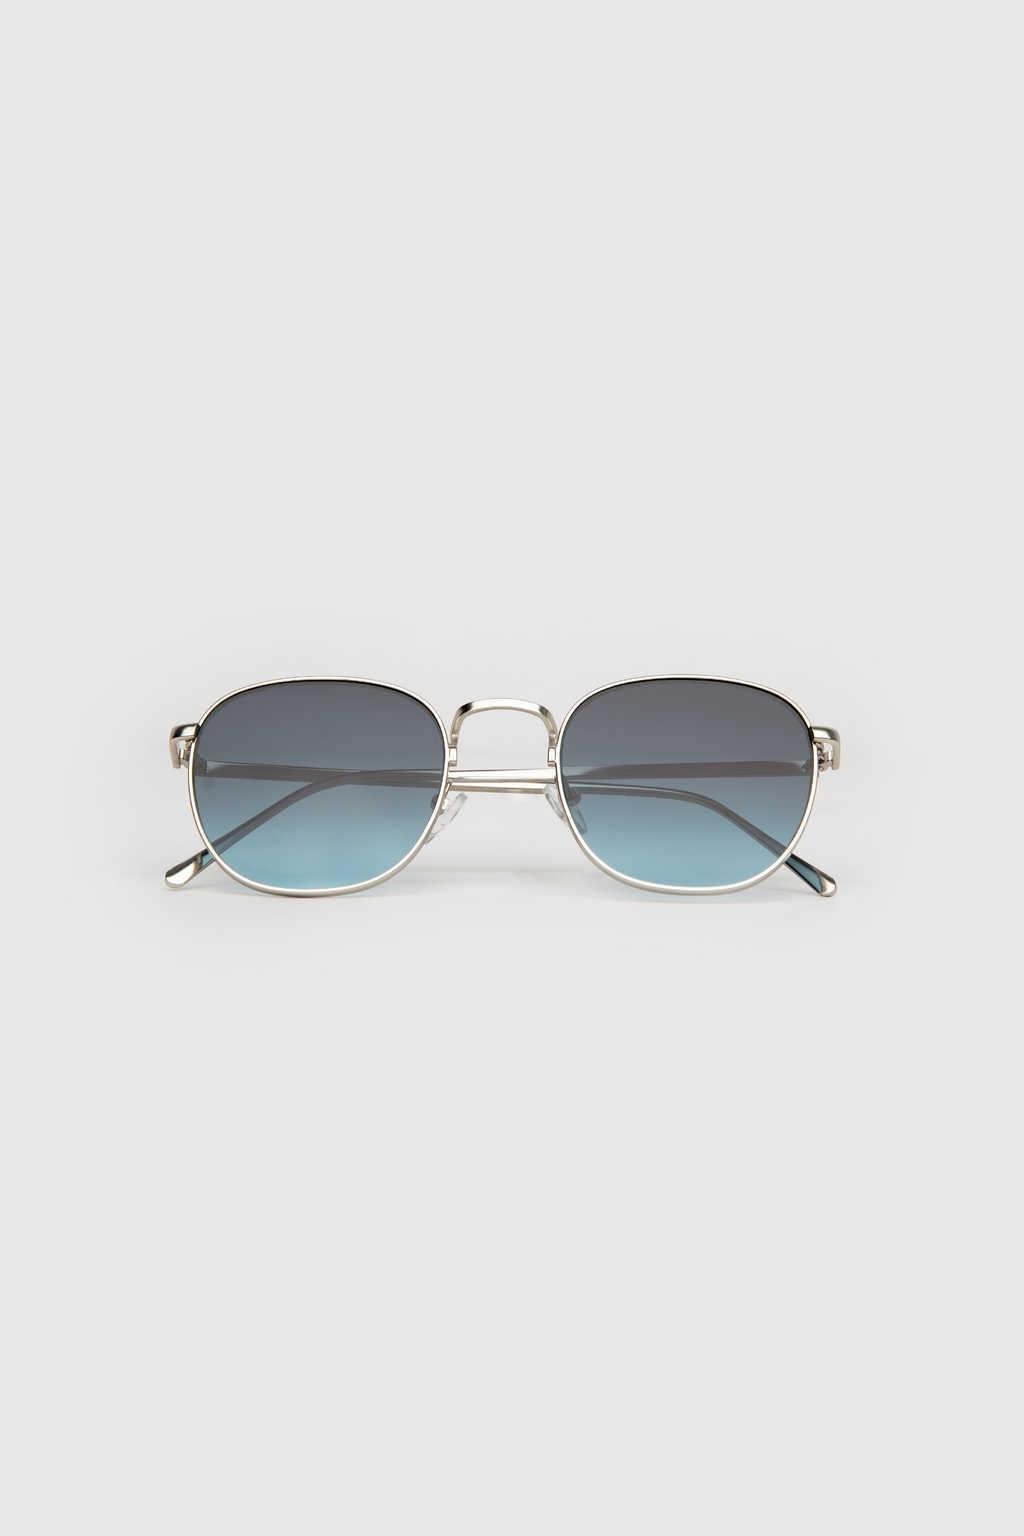 Sunglass 3370 Blue 5